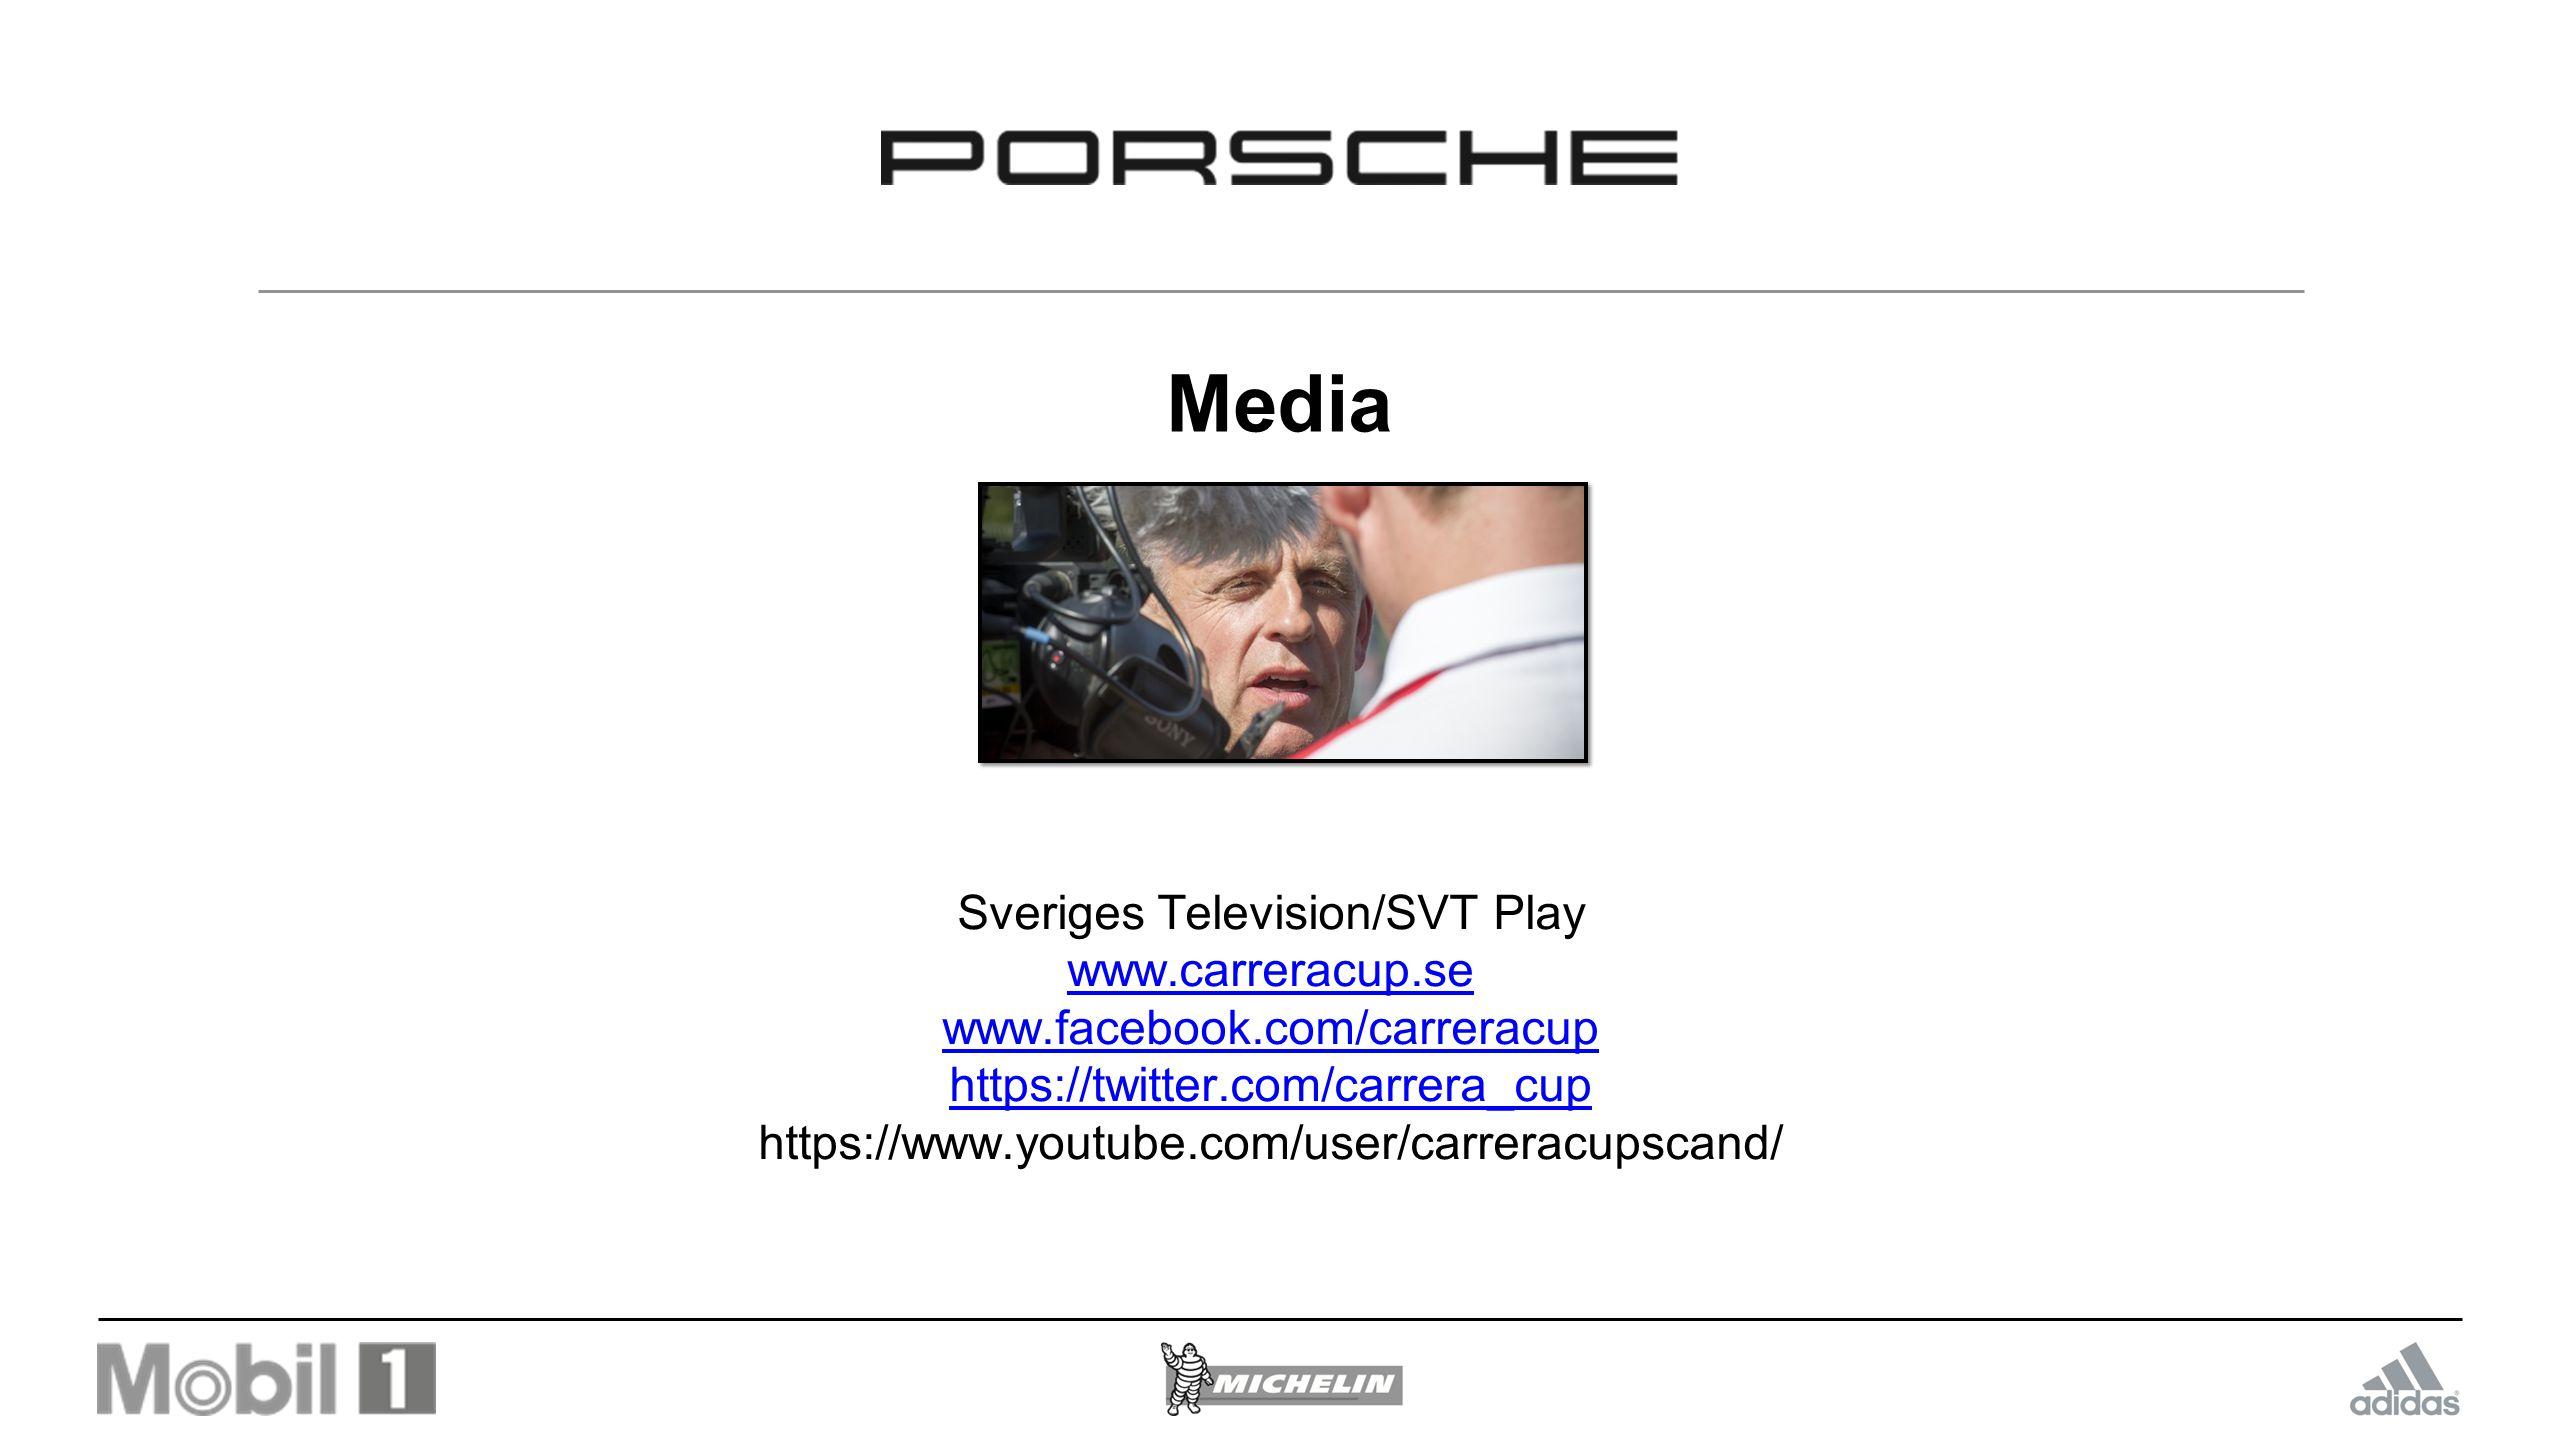 Media Sveriges Television/SVT Play www.carreracup.se www.facebook.com/carreracup https://twitter.com/carrera_cup https://www.youtube.com/user/carreracupscand/